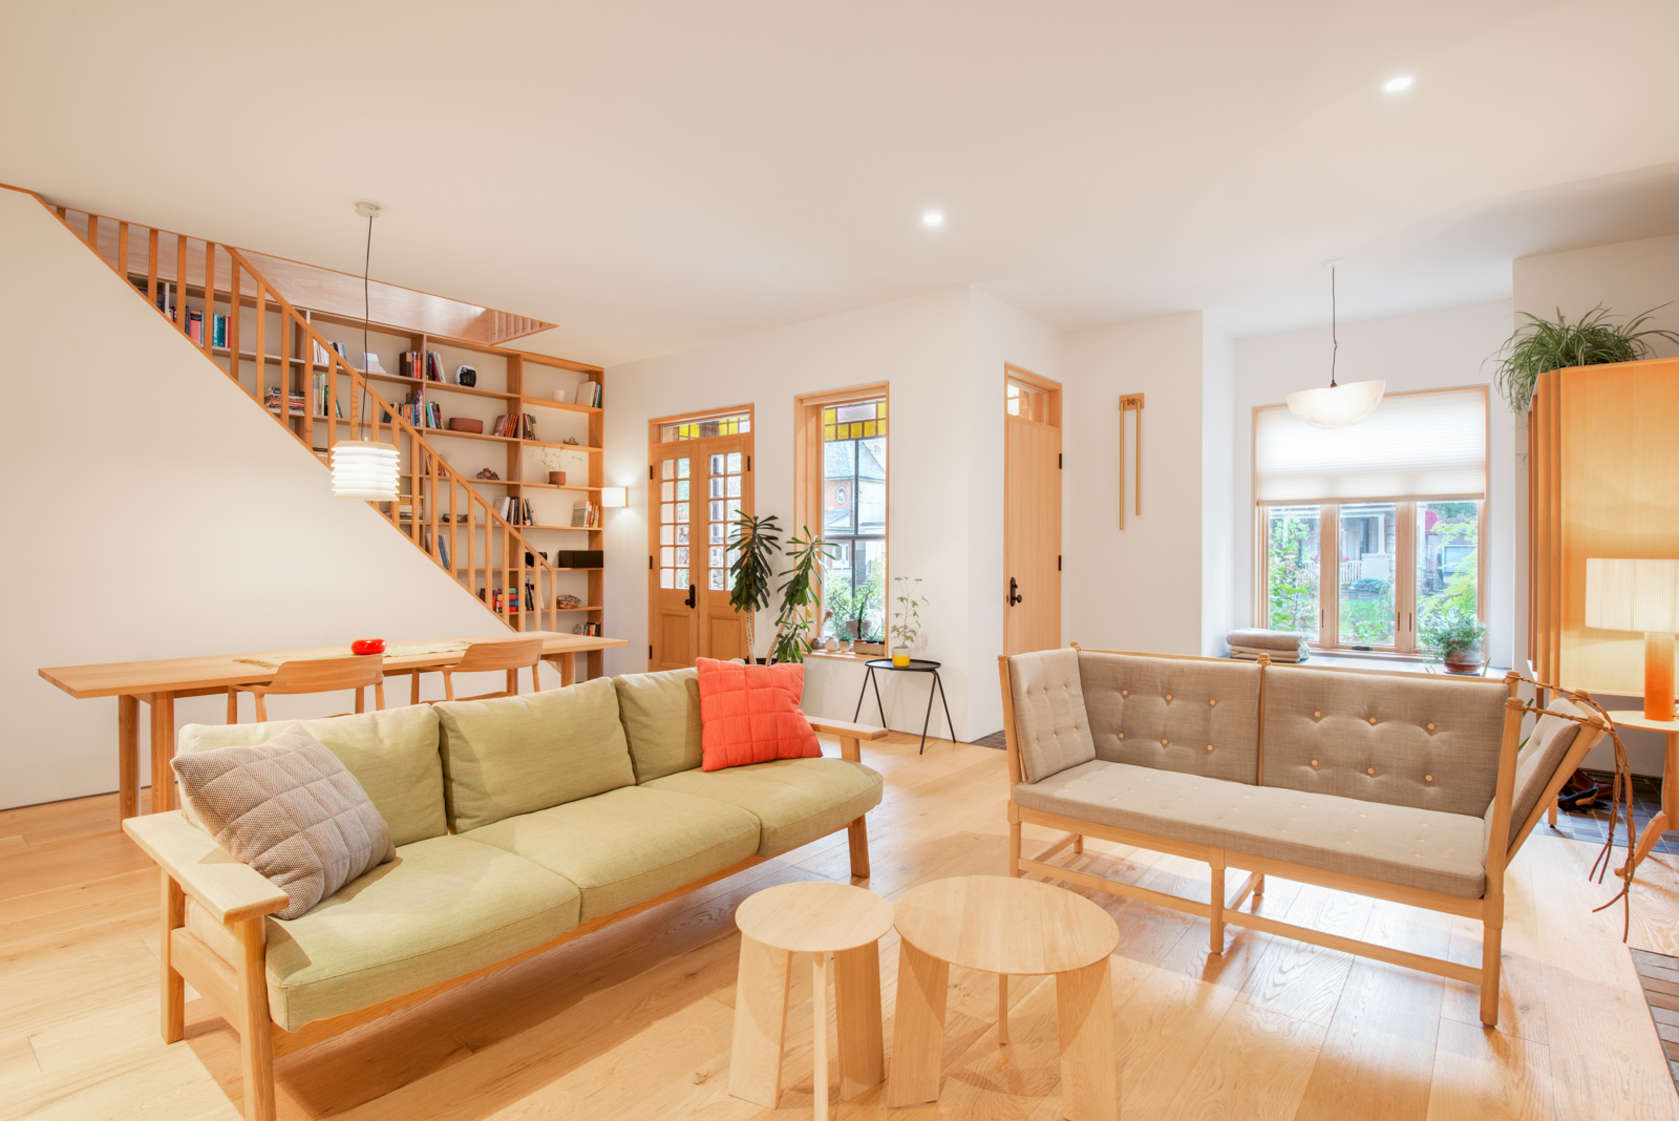 1-casa-no-canada-recebe-reforma-para-integrar-as-areas-comuns